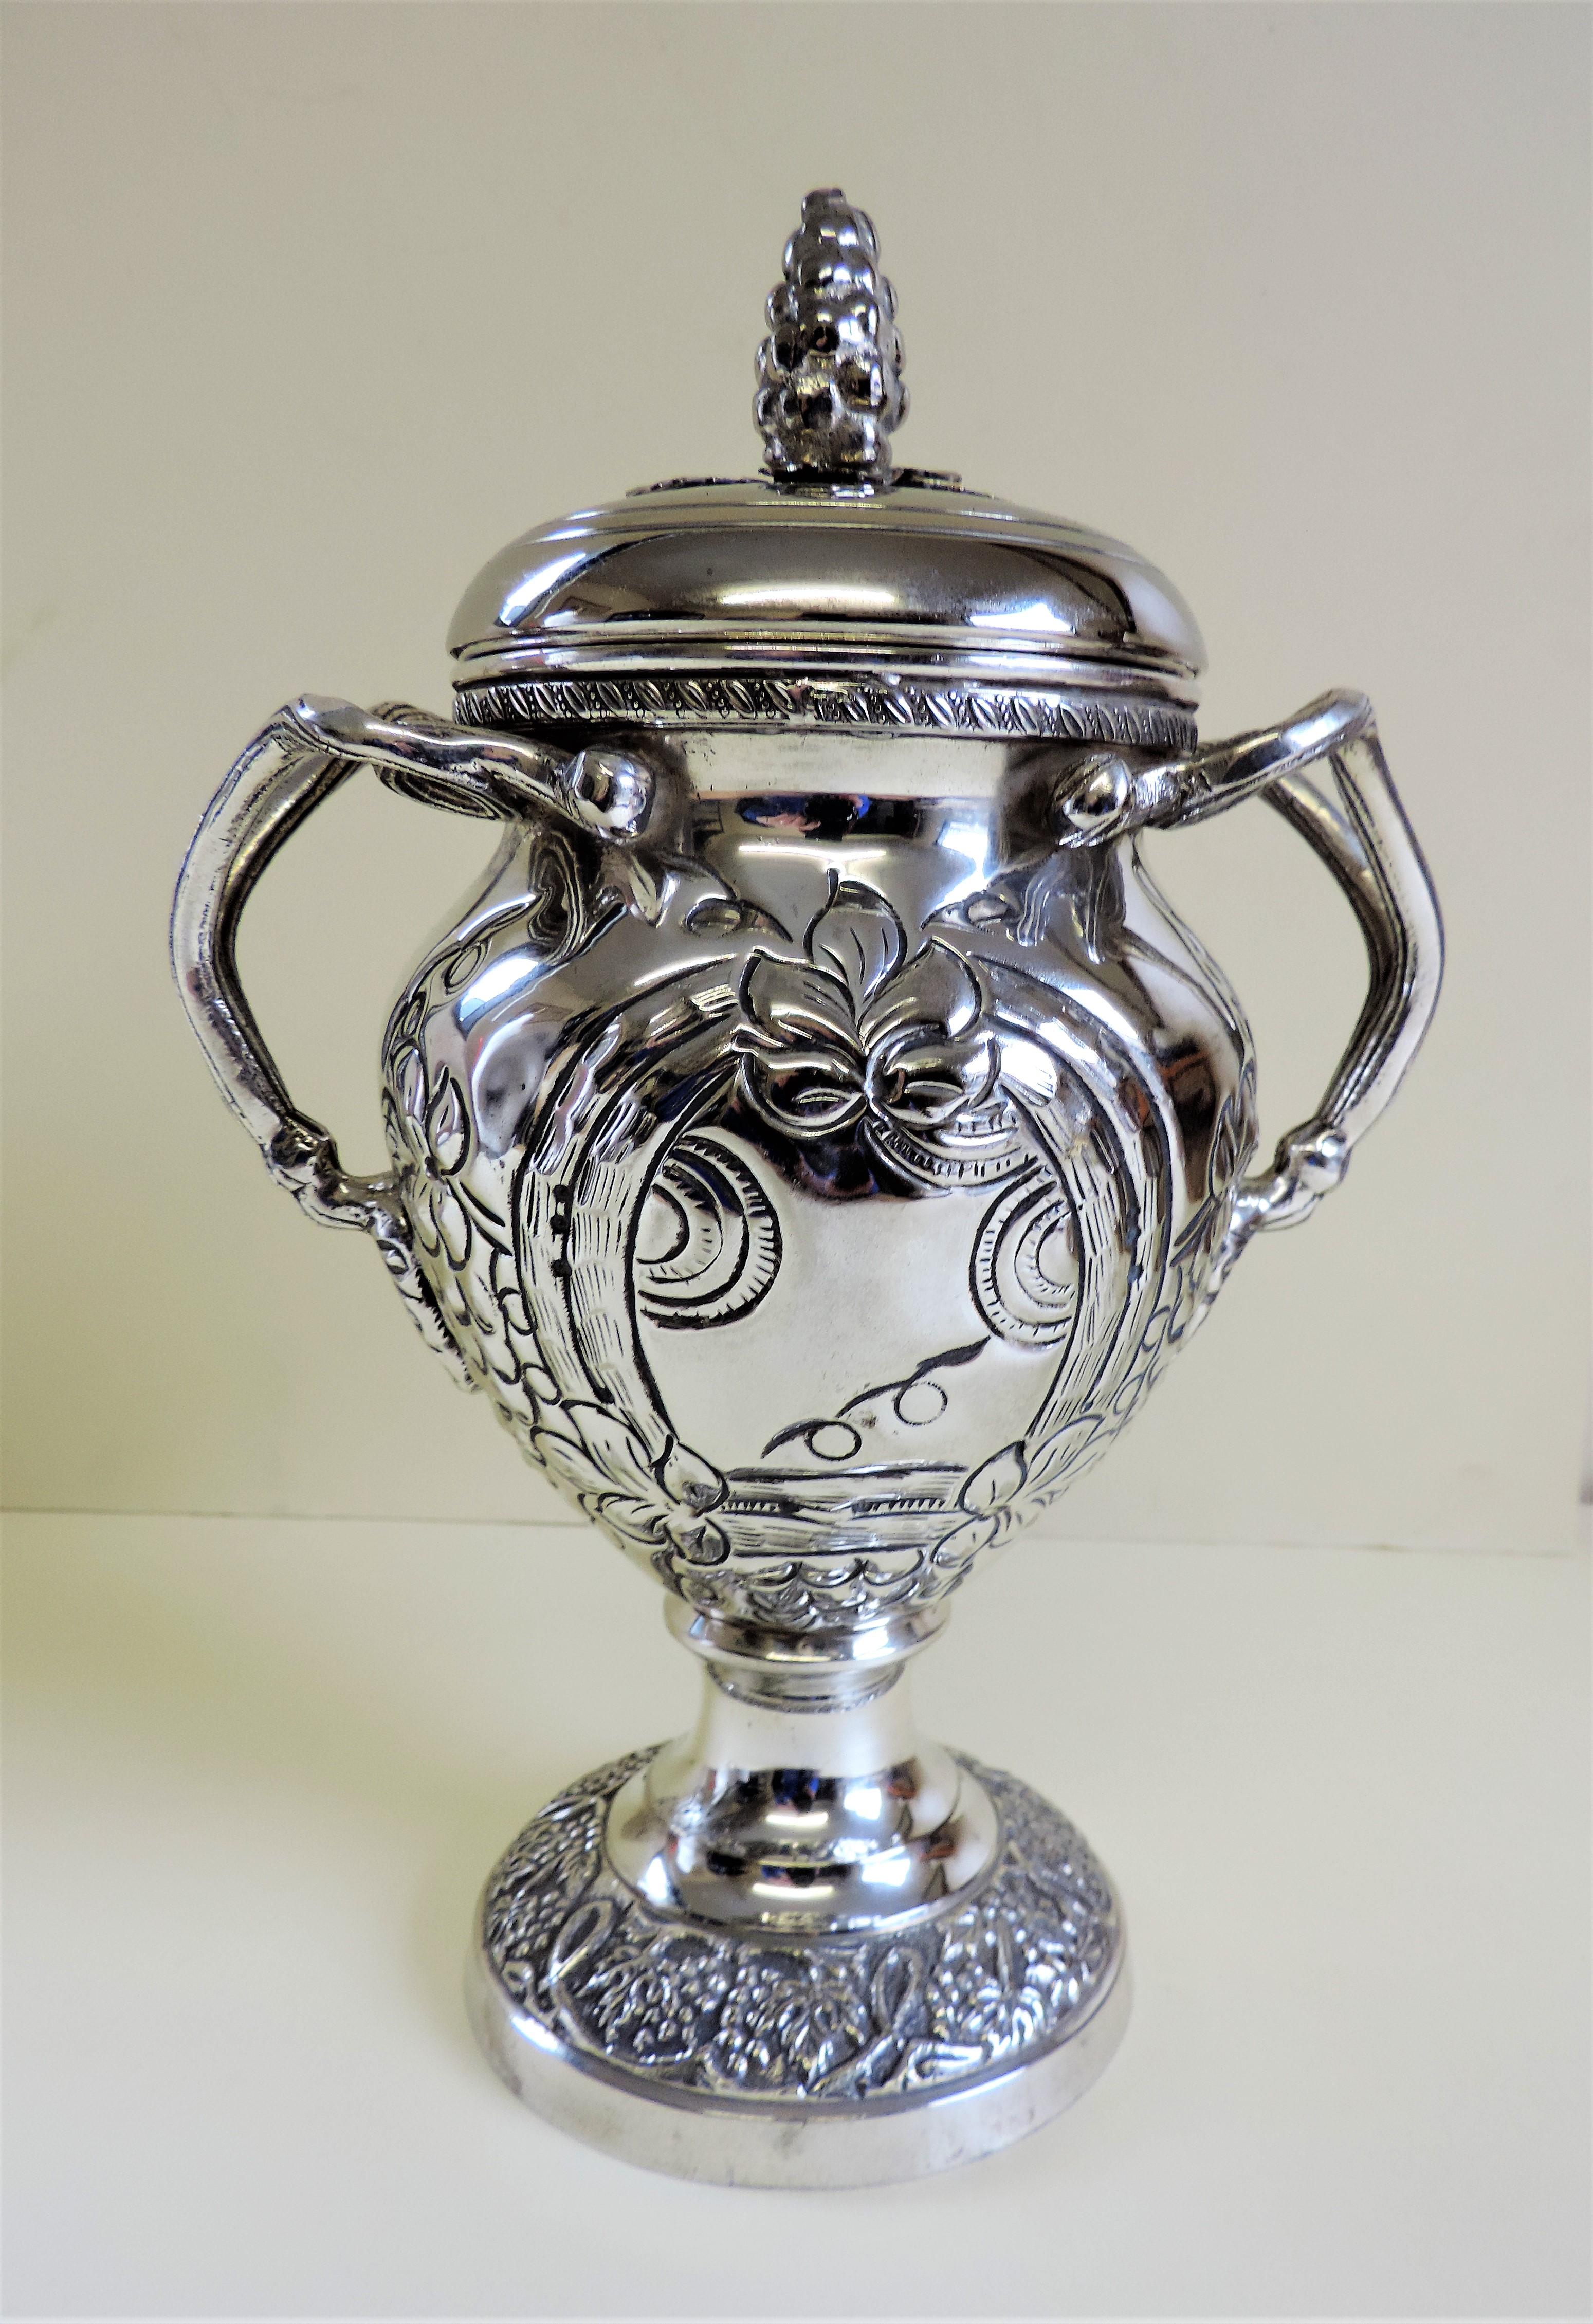 Antique Silver Plate Lidded Urn